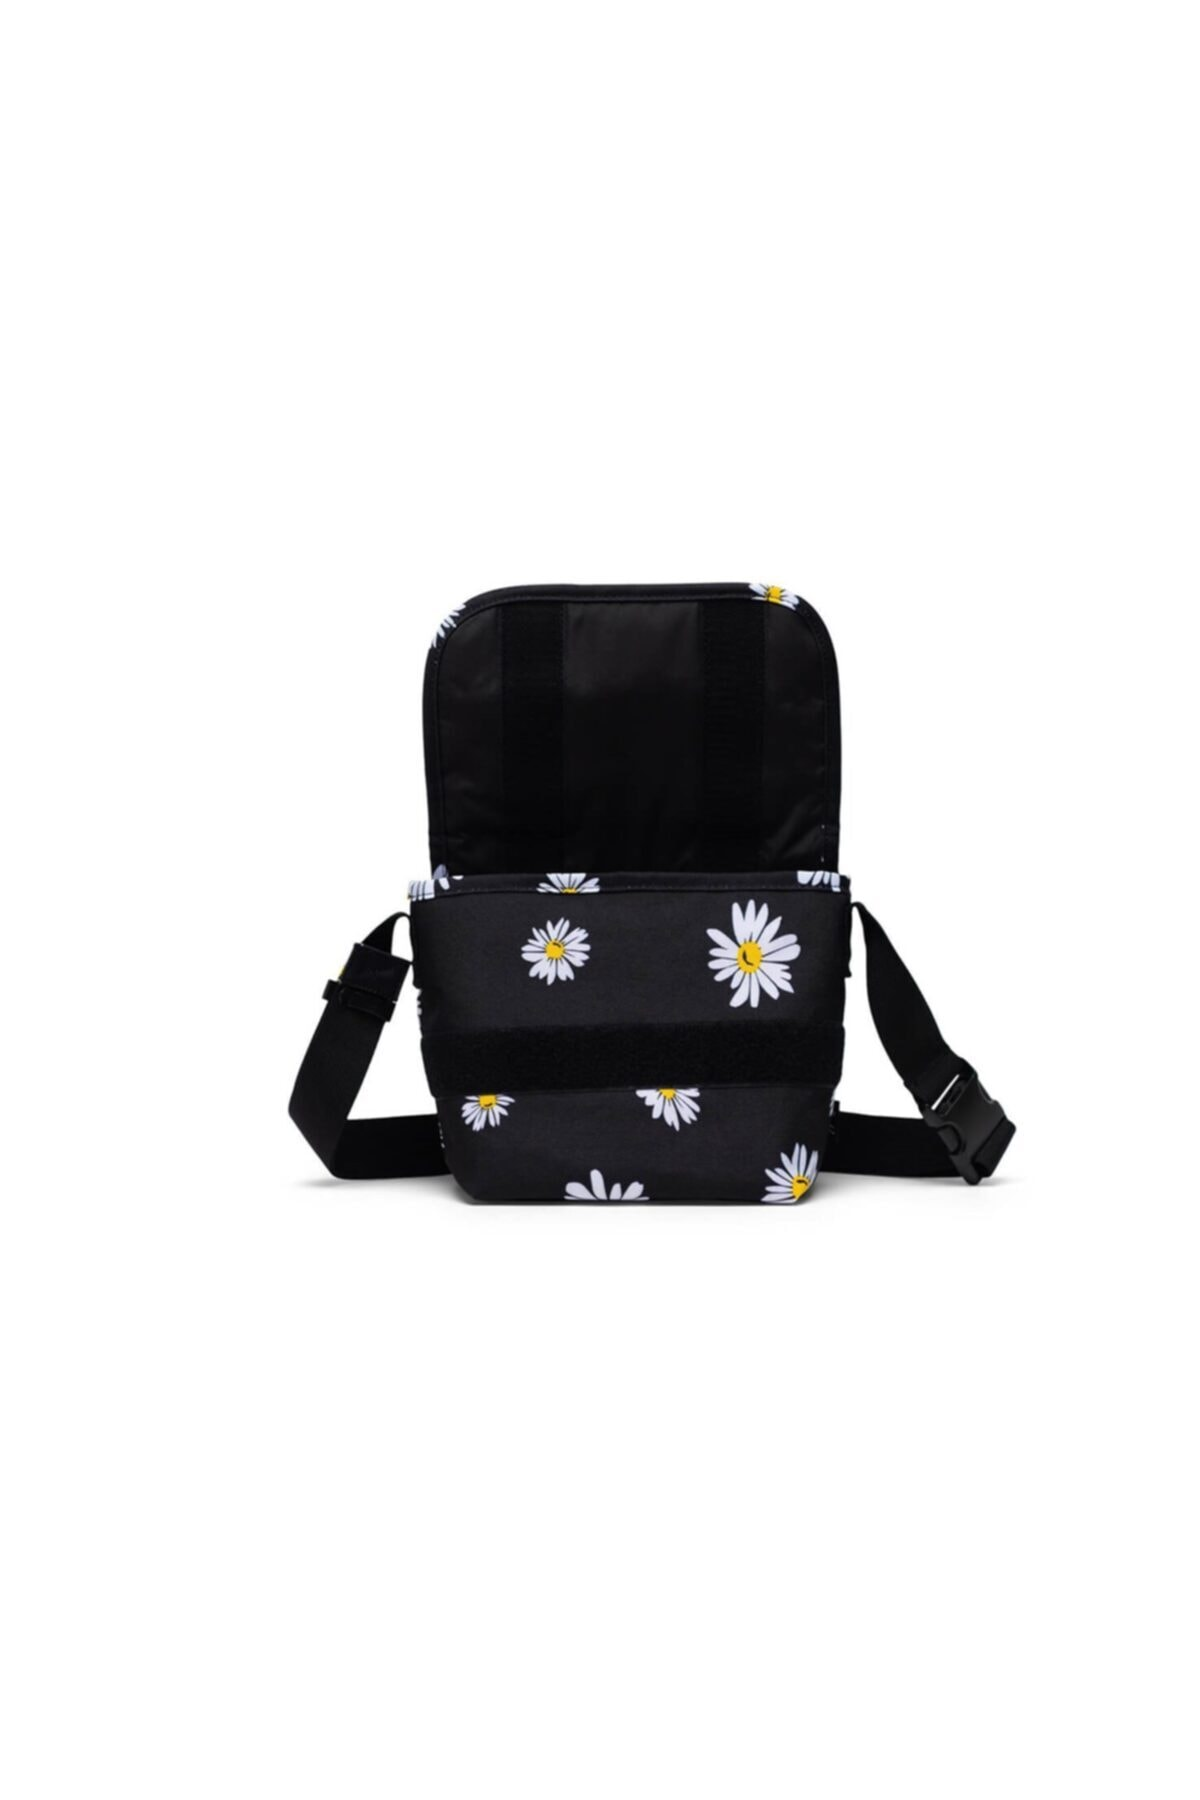 herschel Grade Mini Postacı Unisex Çanta 10657-03527 2